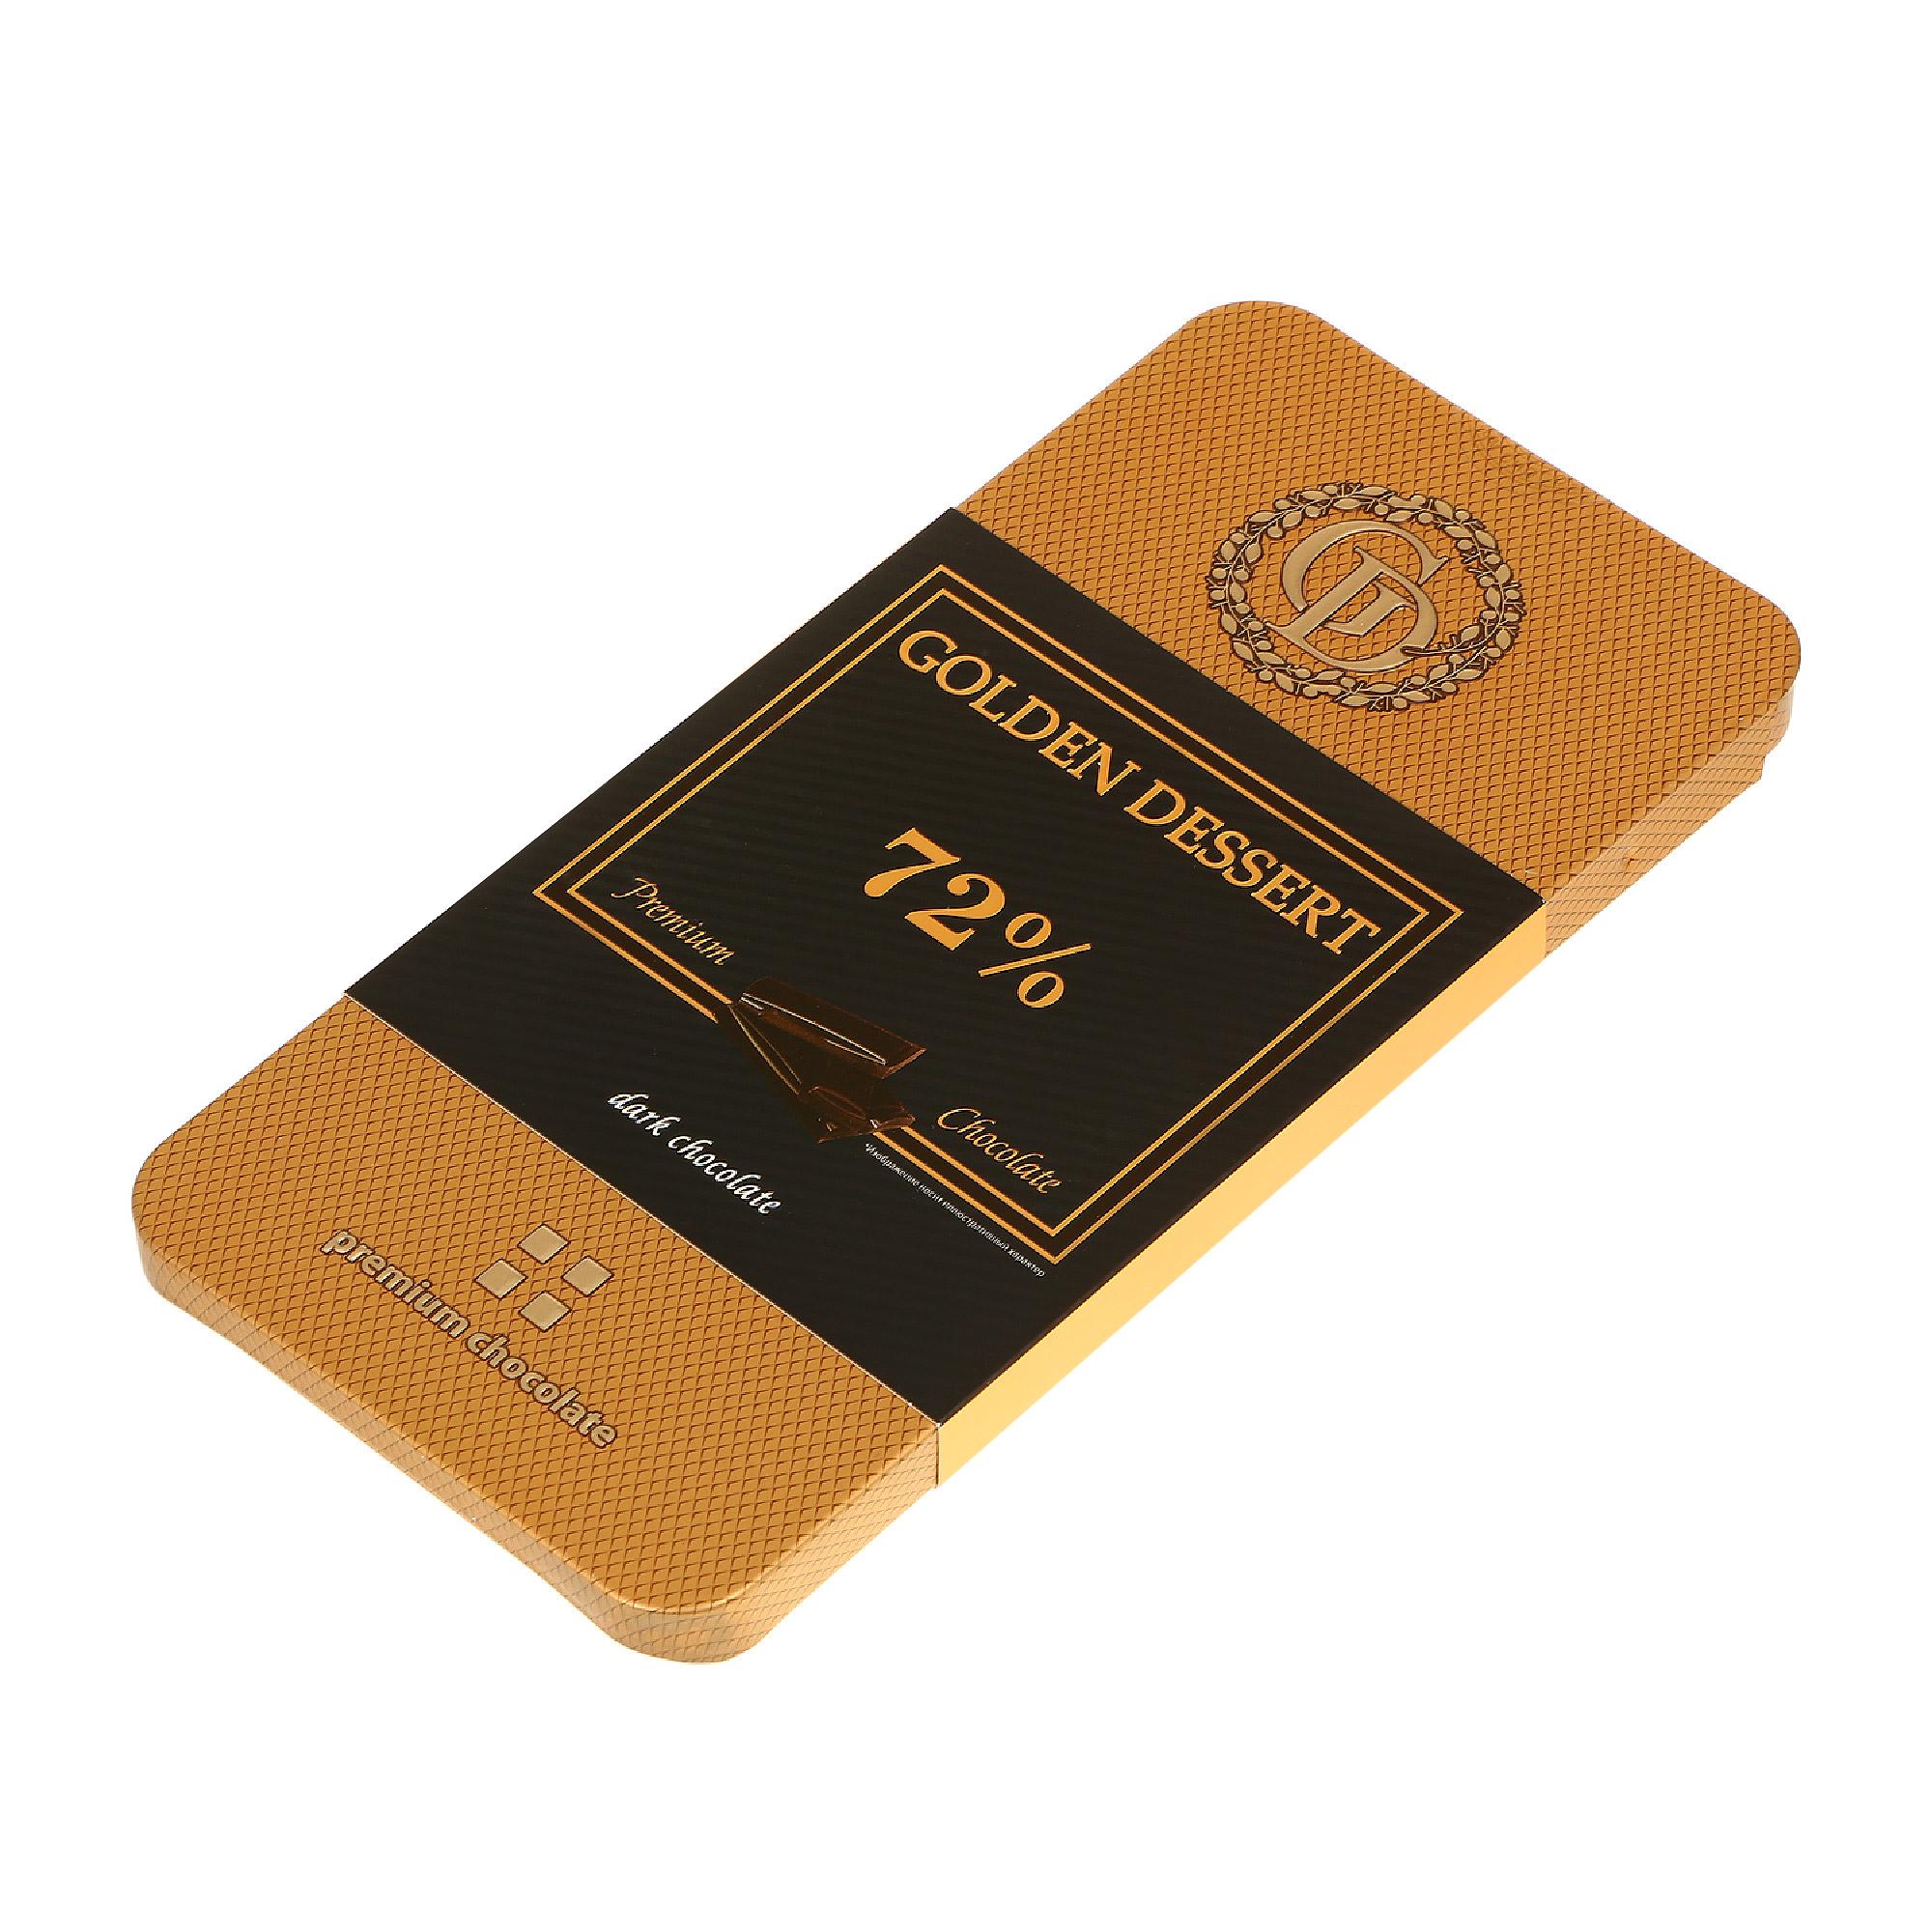 шоколад villars 72% горький 100 г Шоколад горький GOLDEN DESSERT 72% 100 г